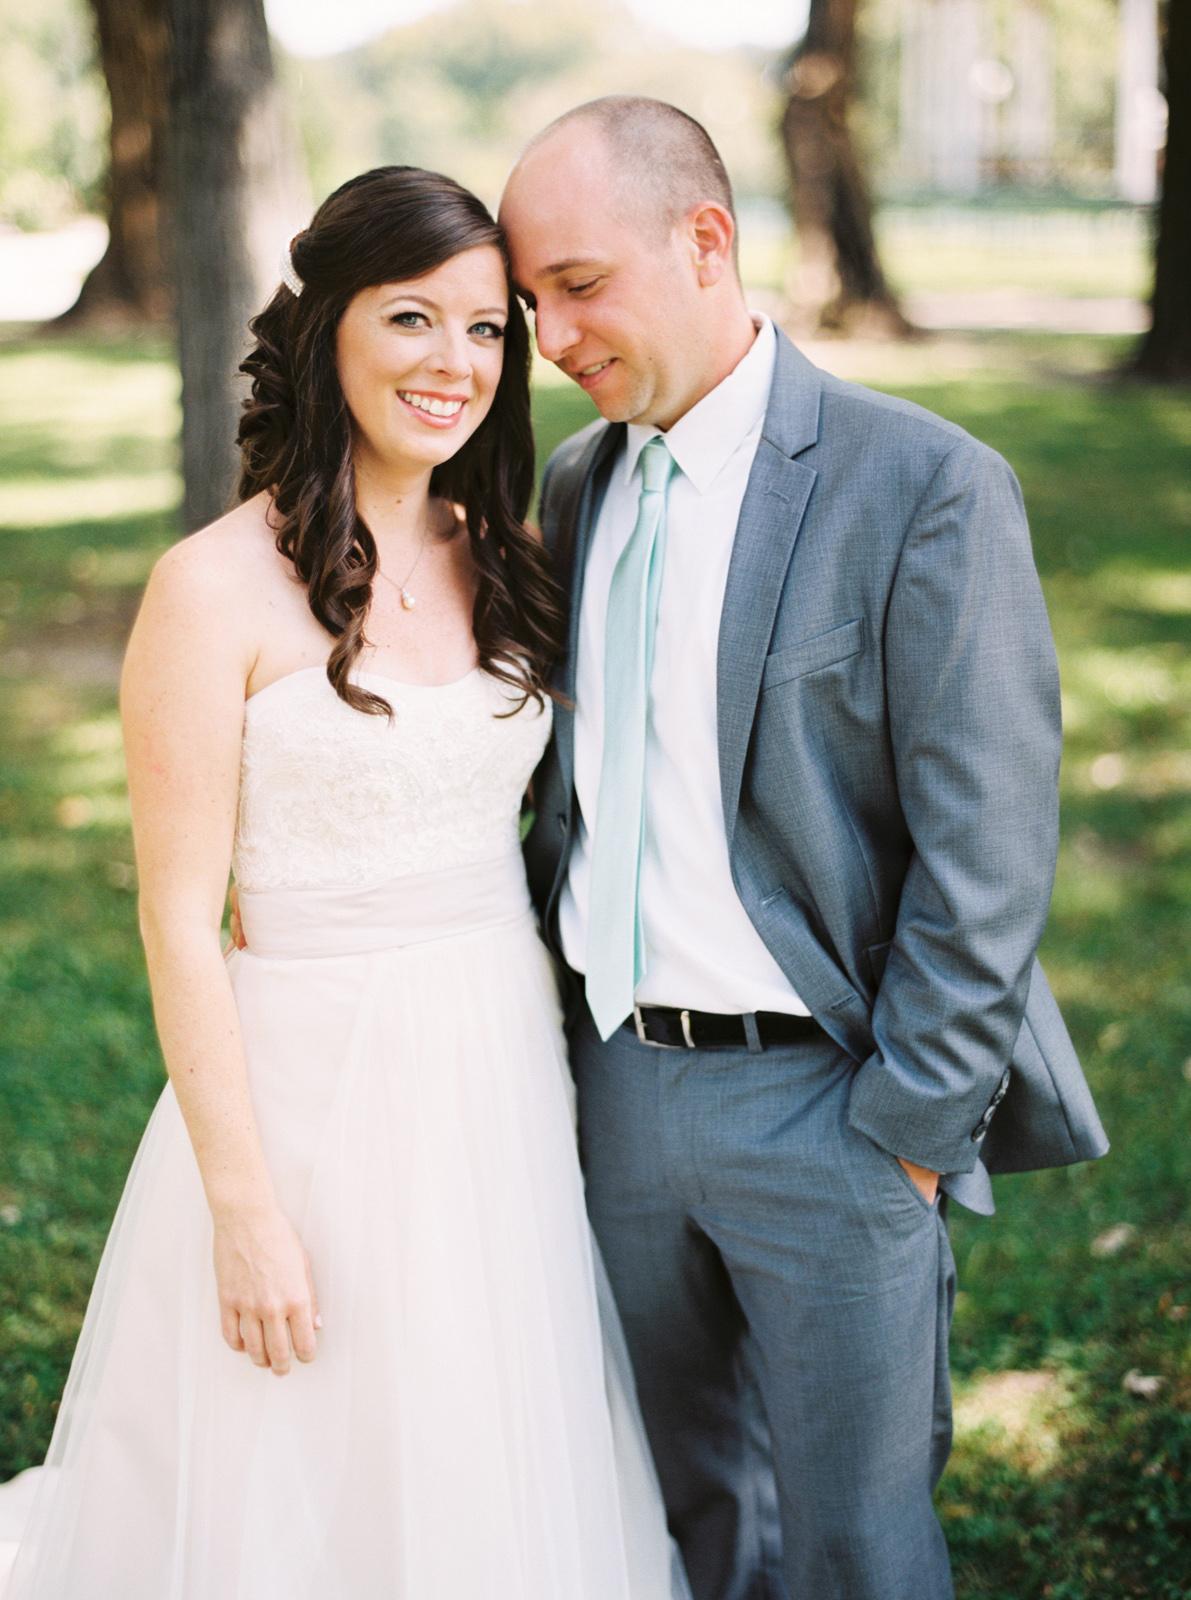 Oldani-Photography-St-Louis-Film-Photographer-Tower-Grove-Park-Wedding-Photographer-Music-Stand-8604_03.jpg